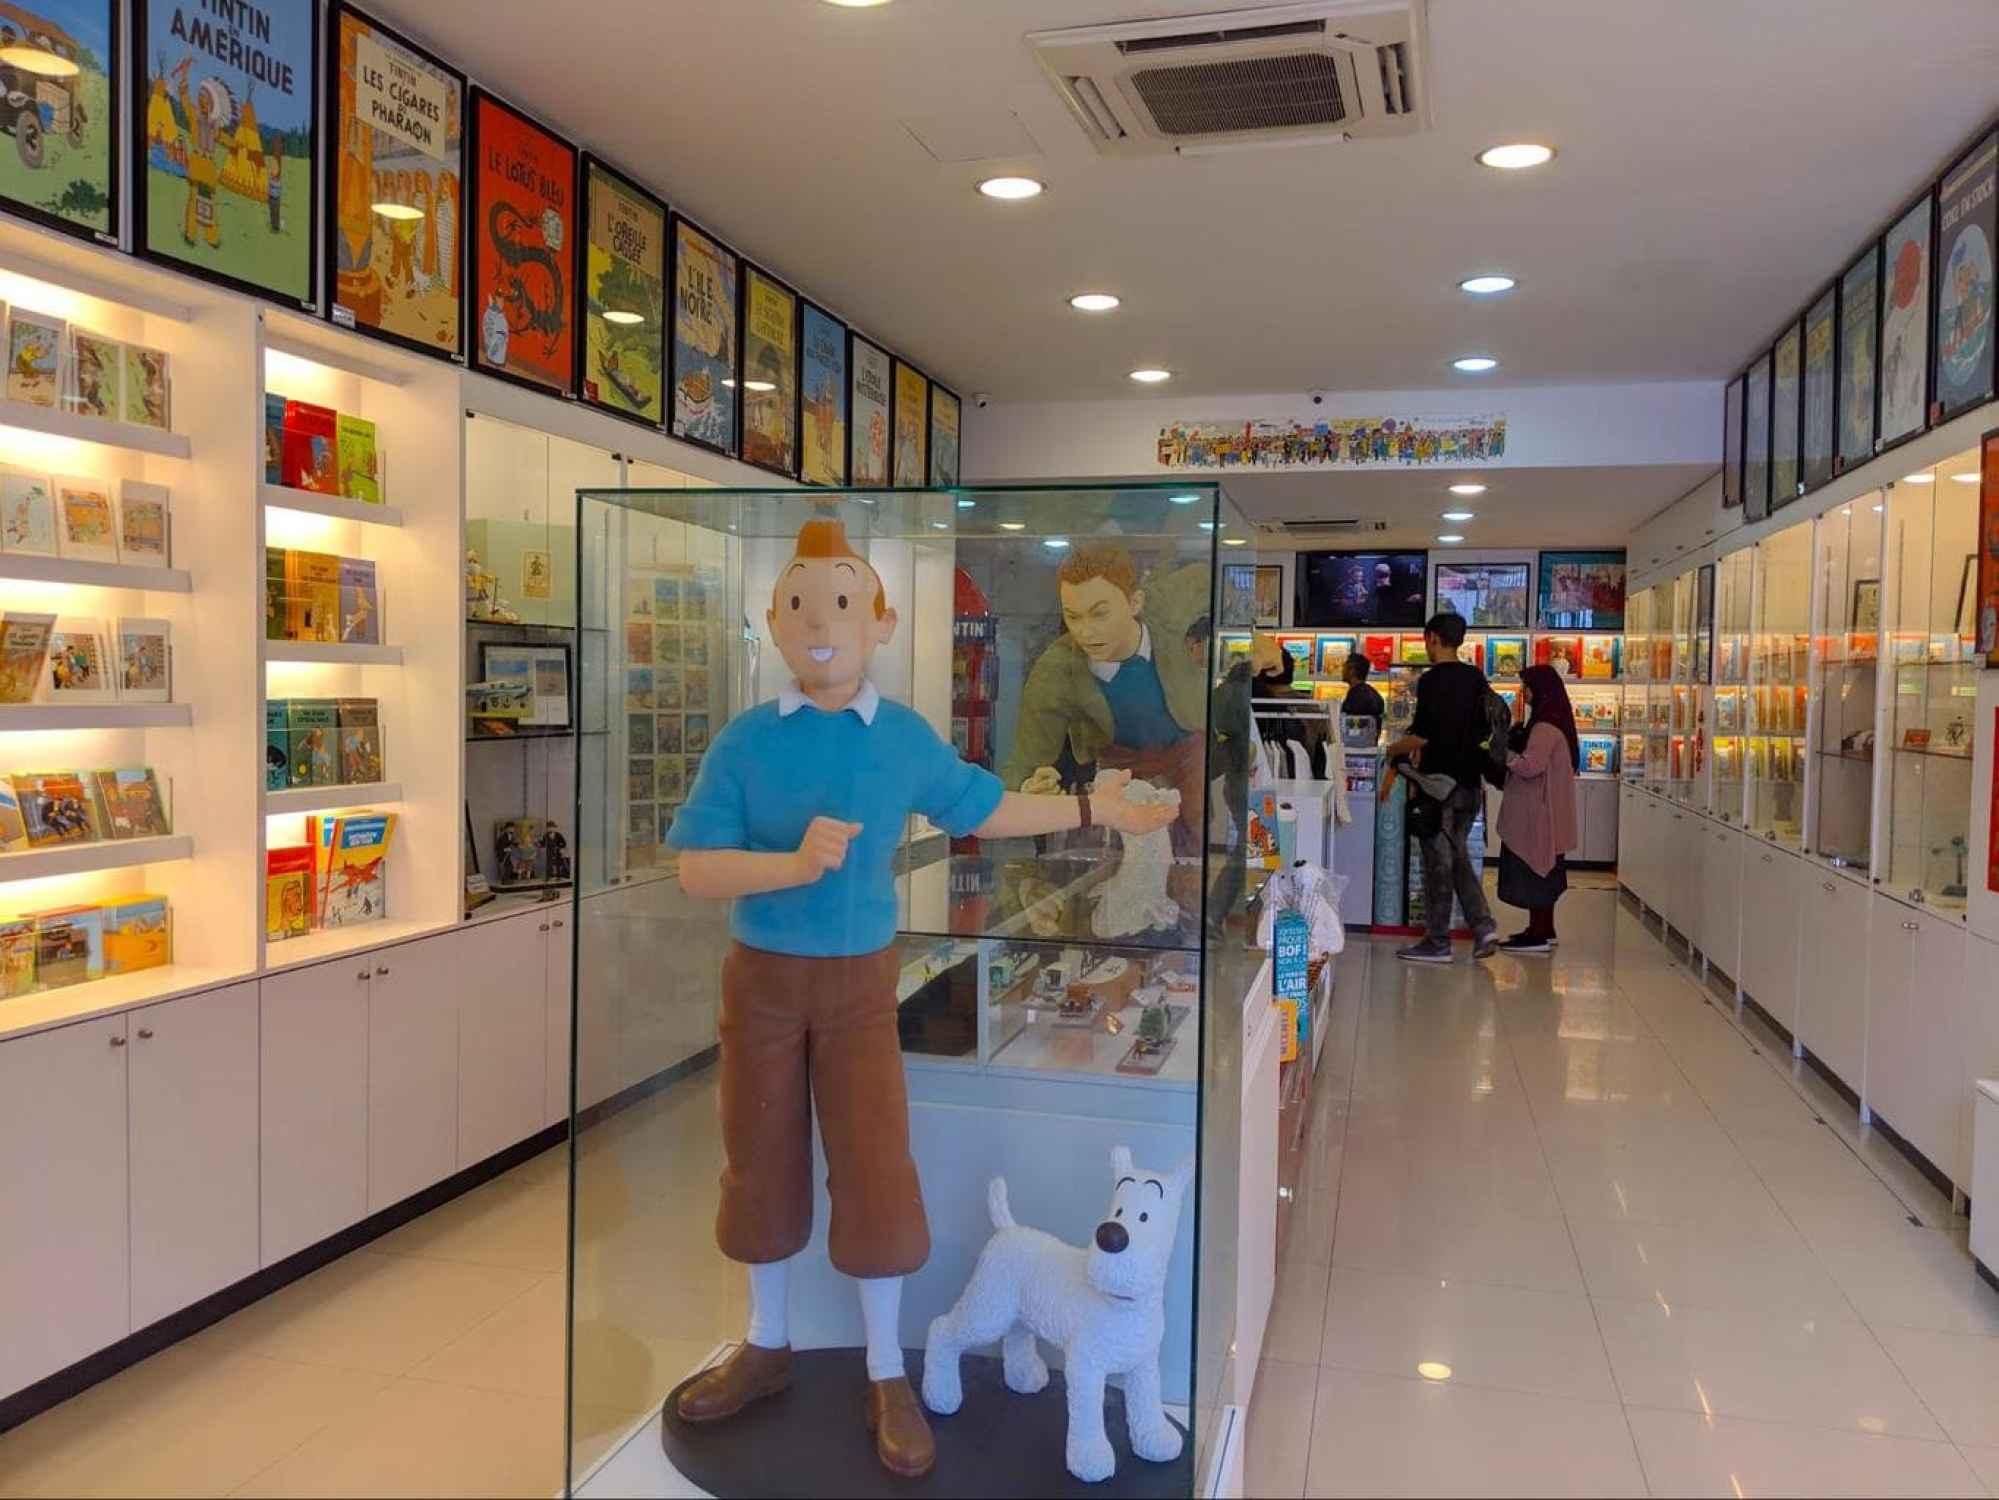 Tintin Shop interior